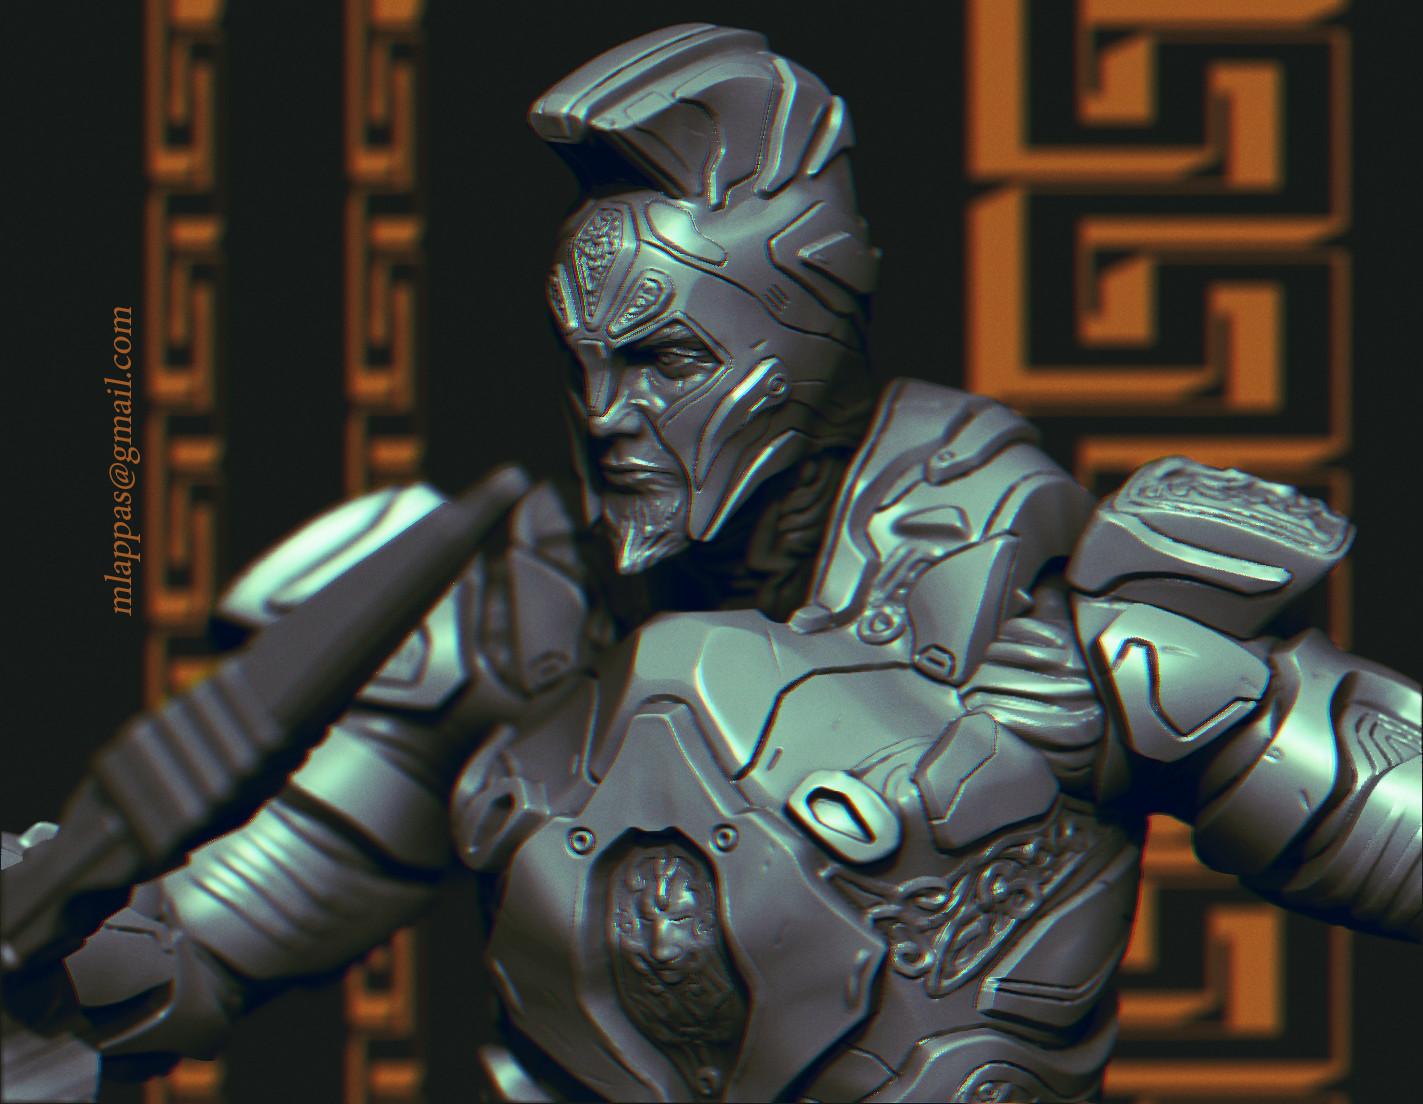 Sci Fi Spartan Soldier render & 3D print